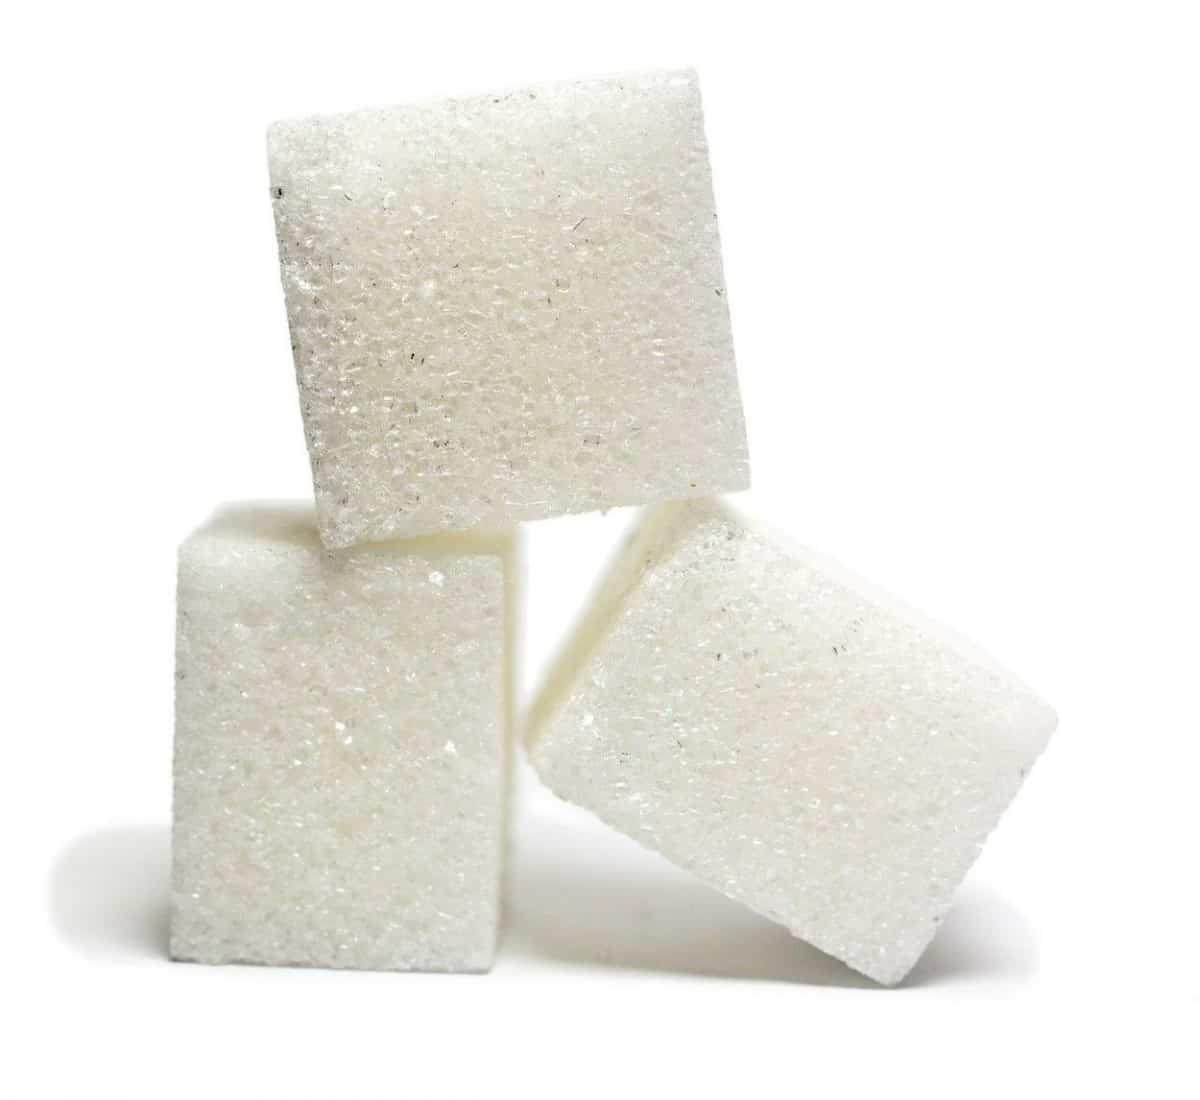 Three lumps of sugar.